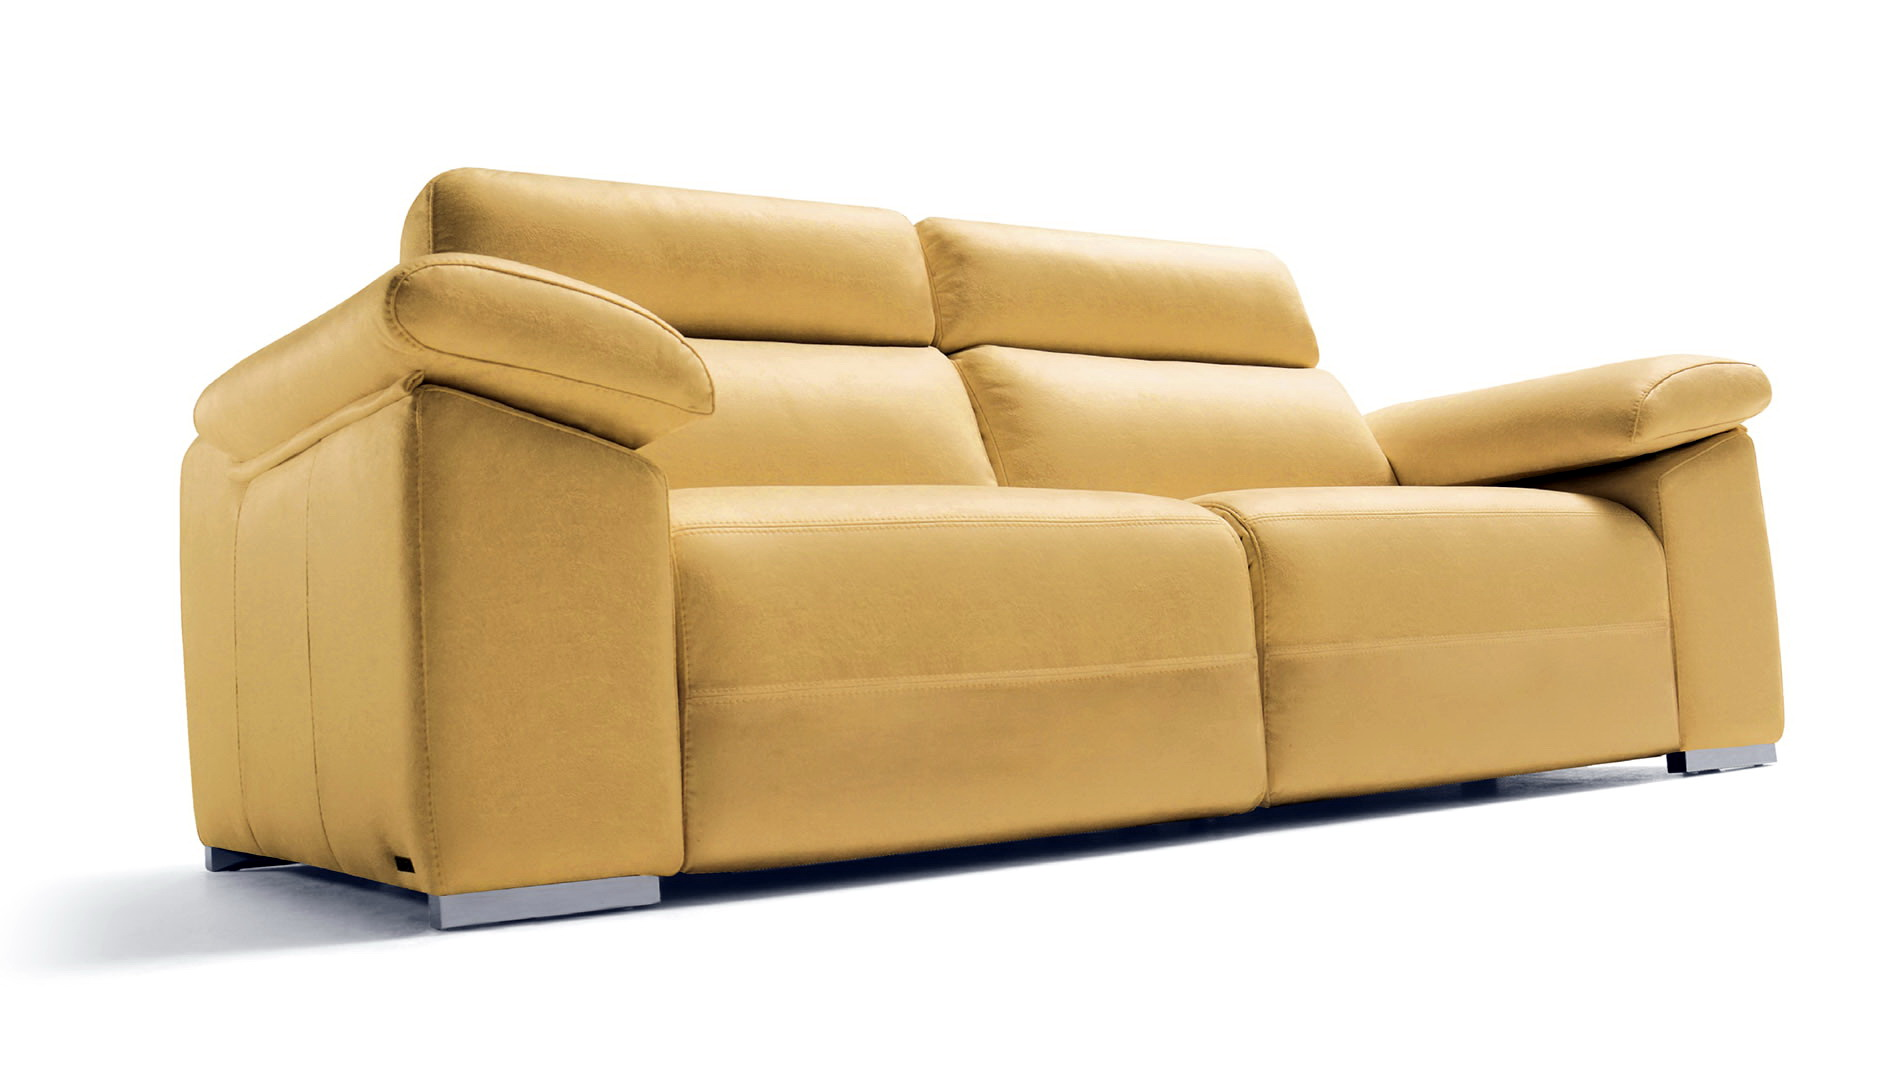 Sofá Chaise modular by PACO BAUTISTA 38 en muebles antoñán® León